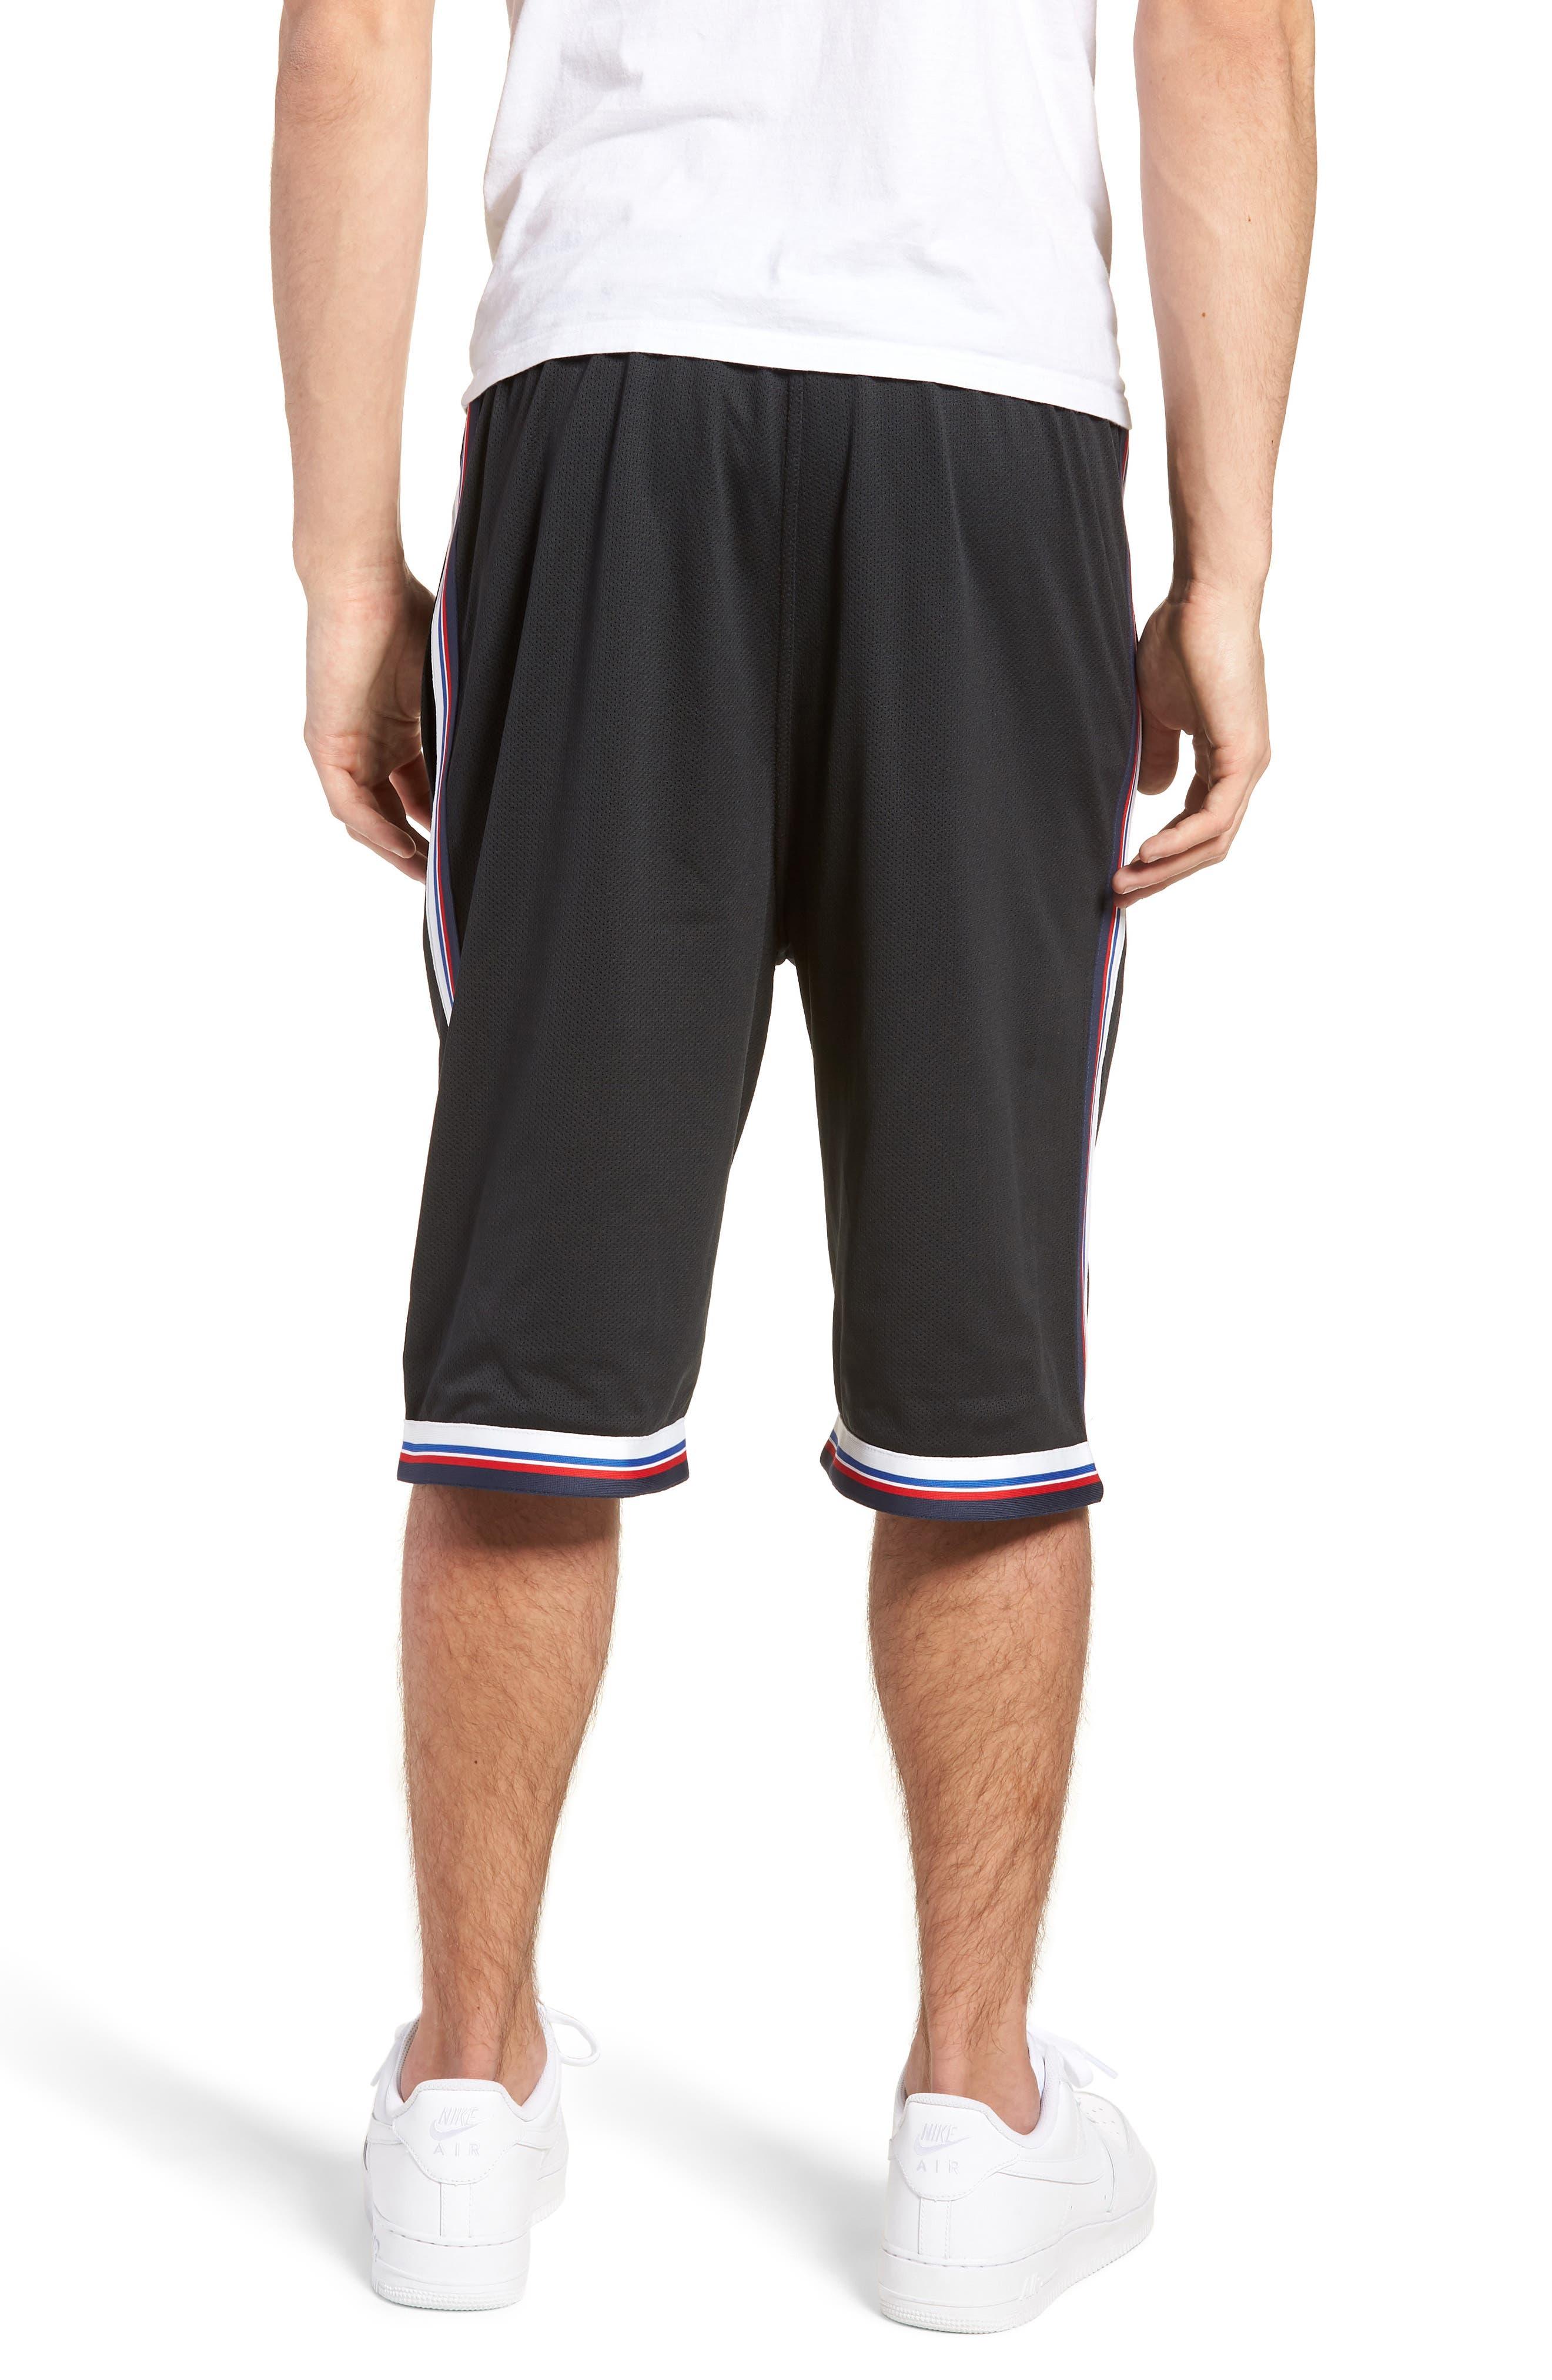 Lightweight Basketball Shorts,                             Alternate thumbnail 2, color,                             001